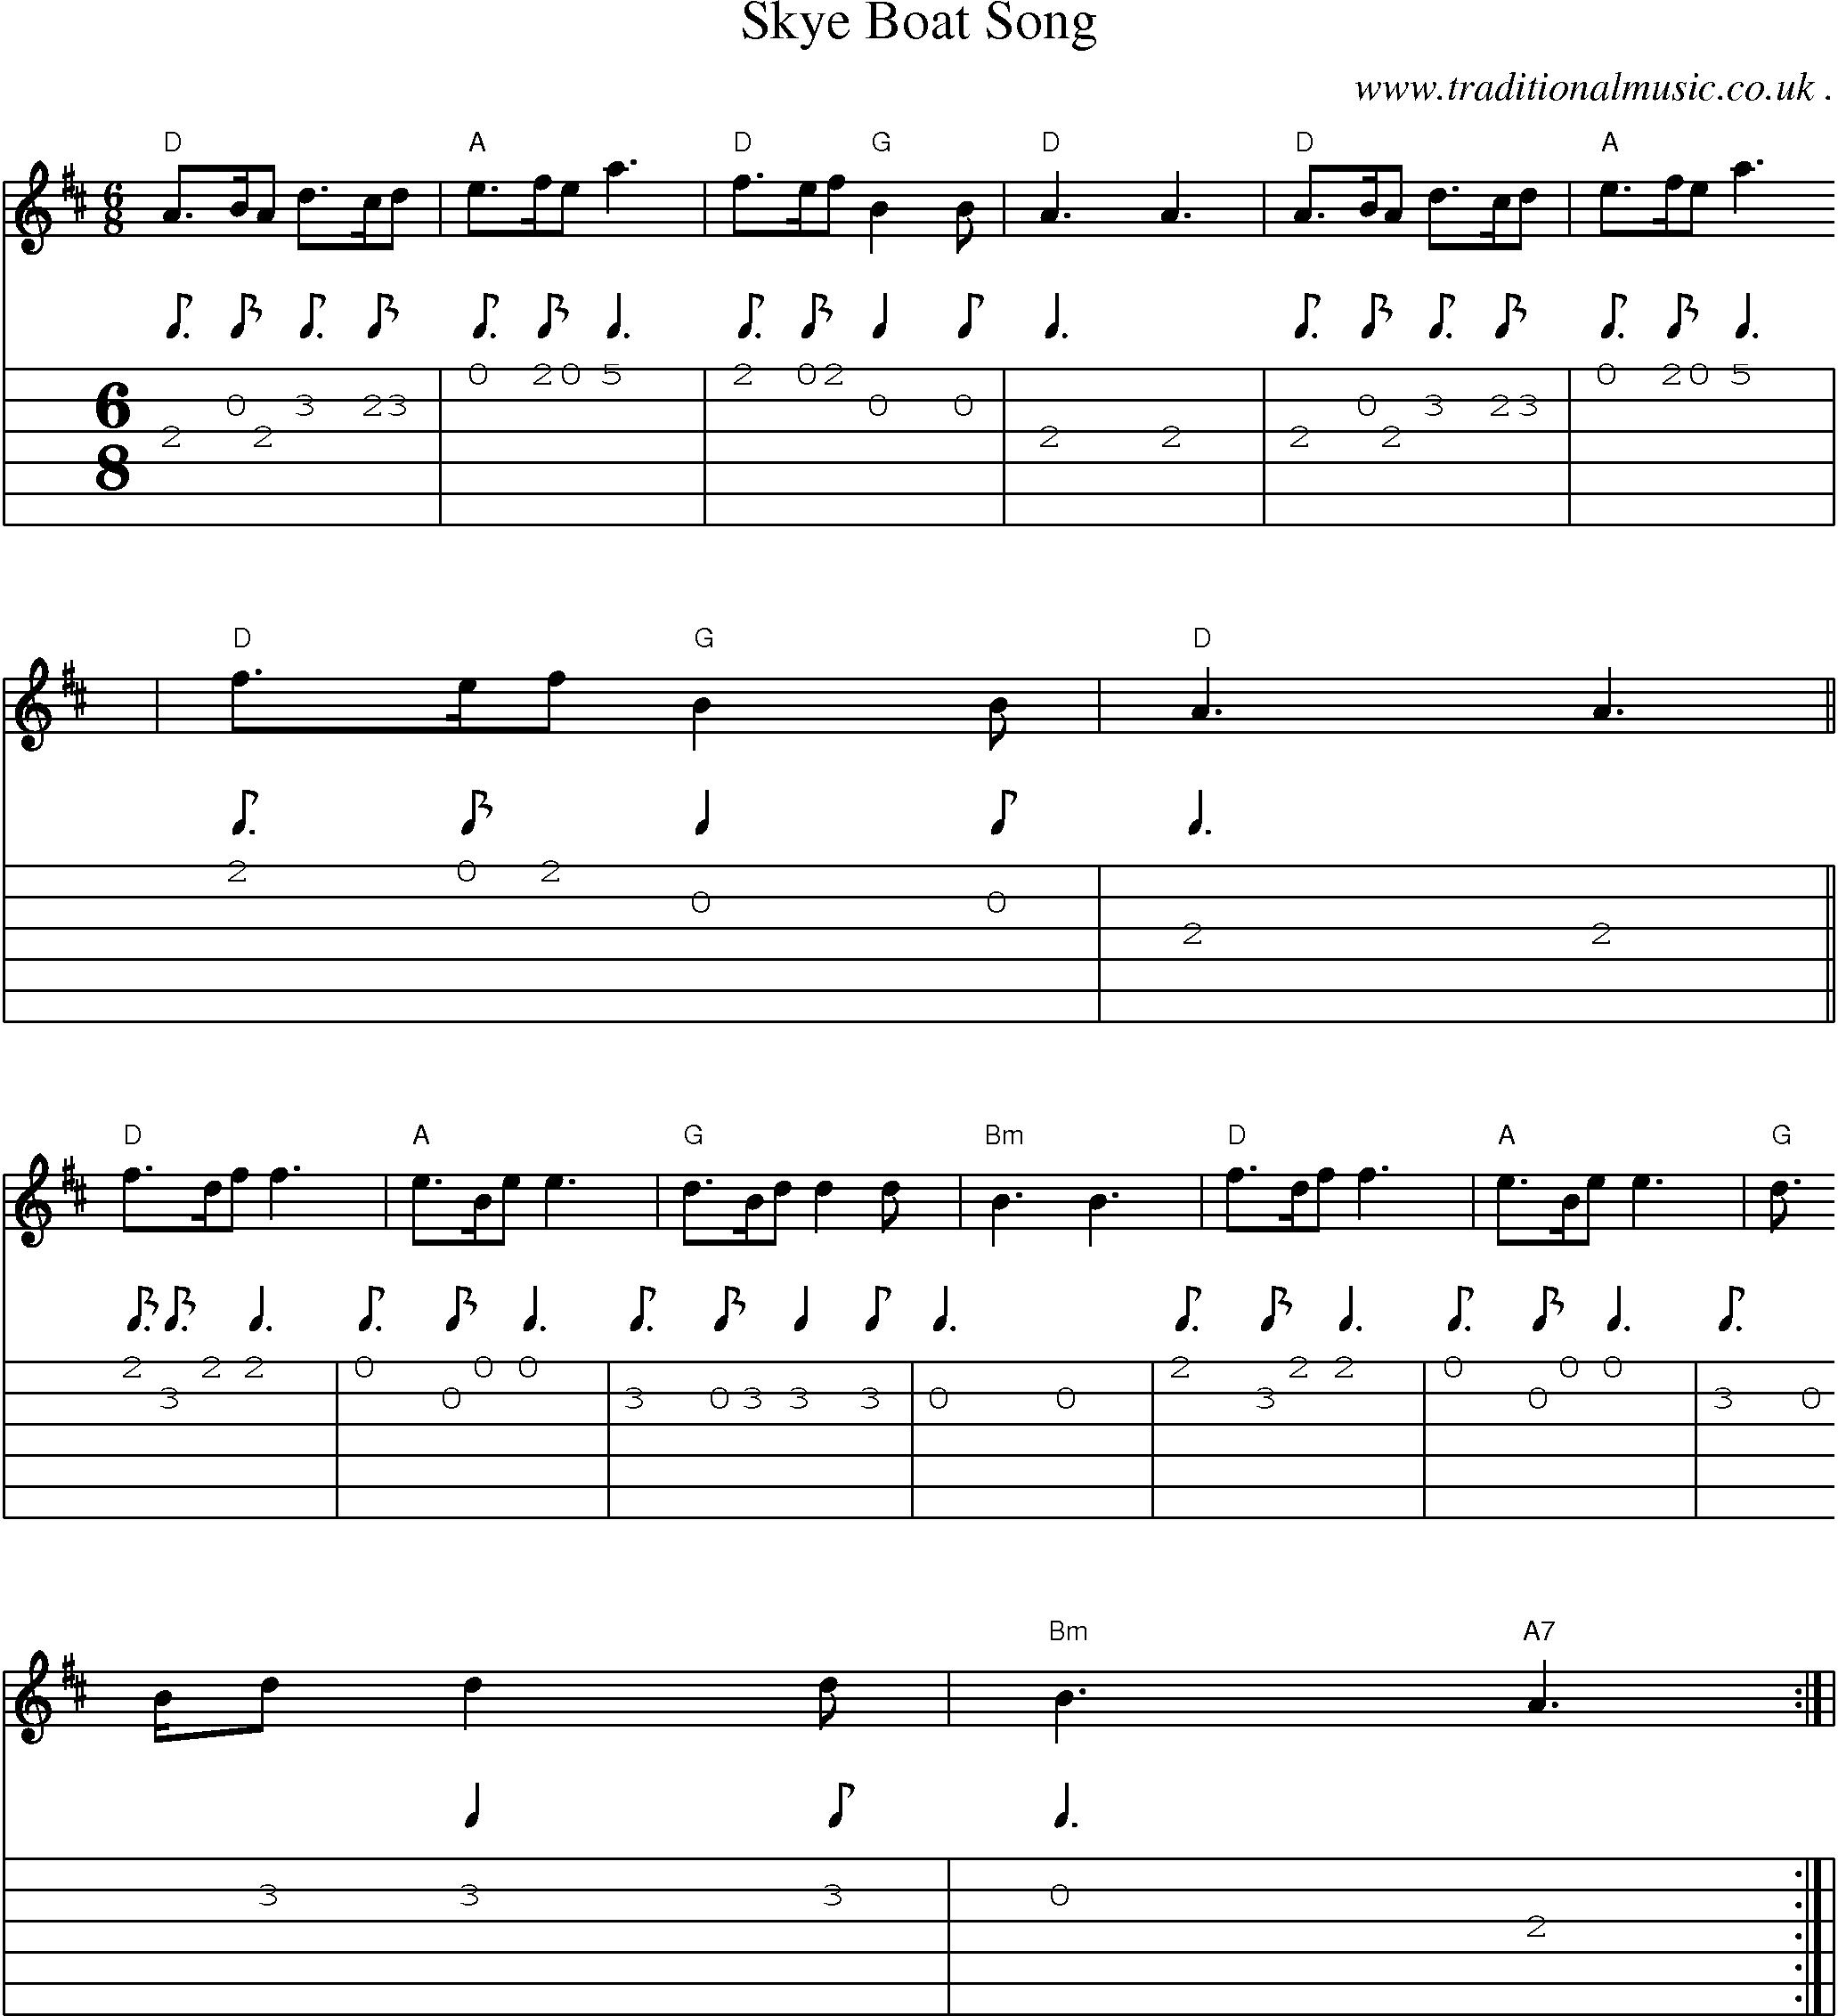 Scottish Tune Score Guitar Chords Tabs Skye Boat Song Guitar